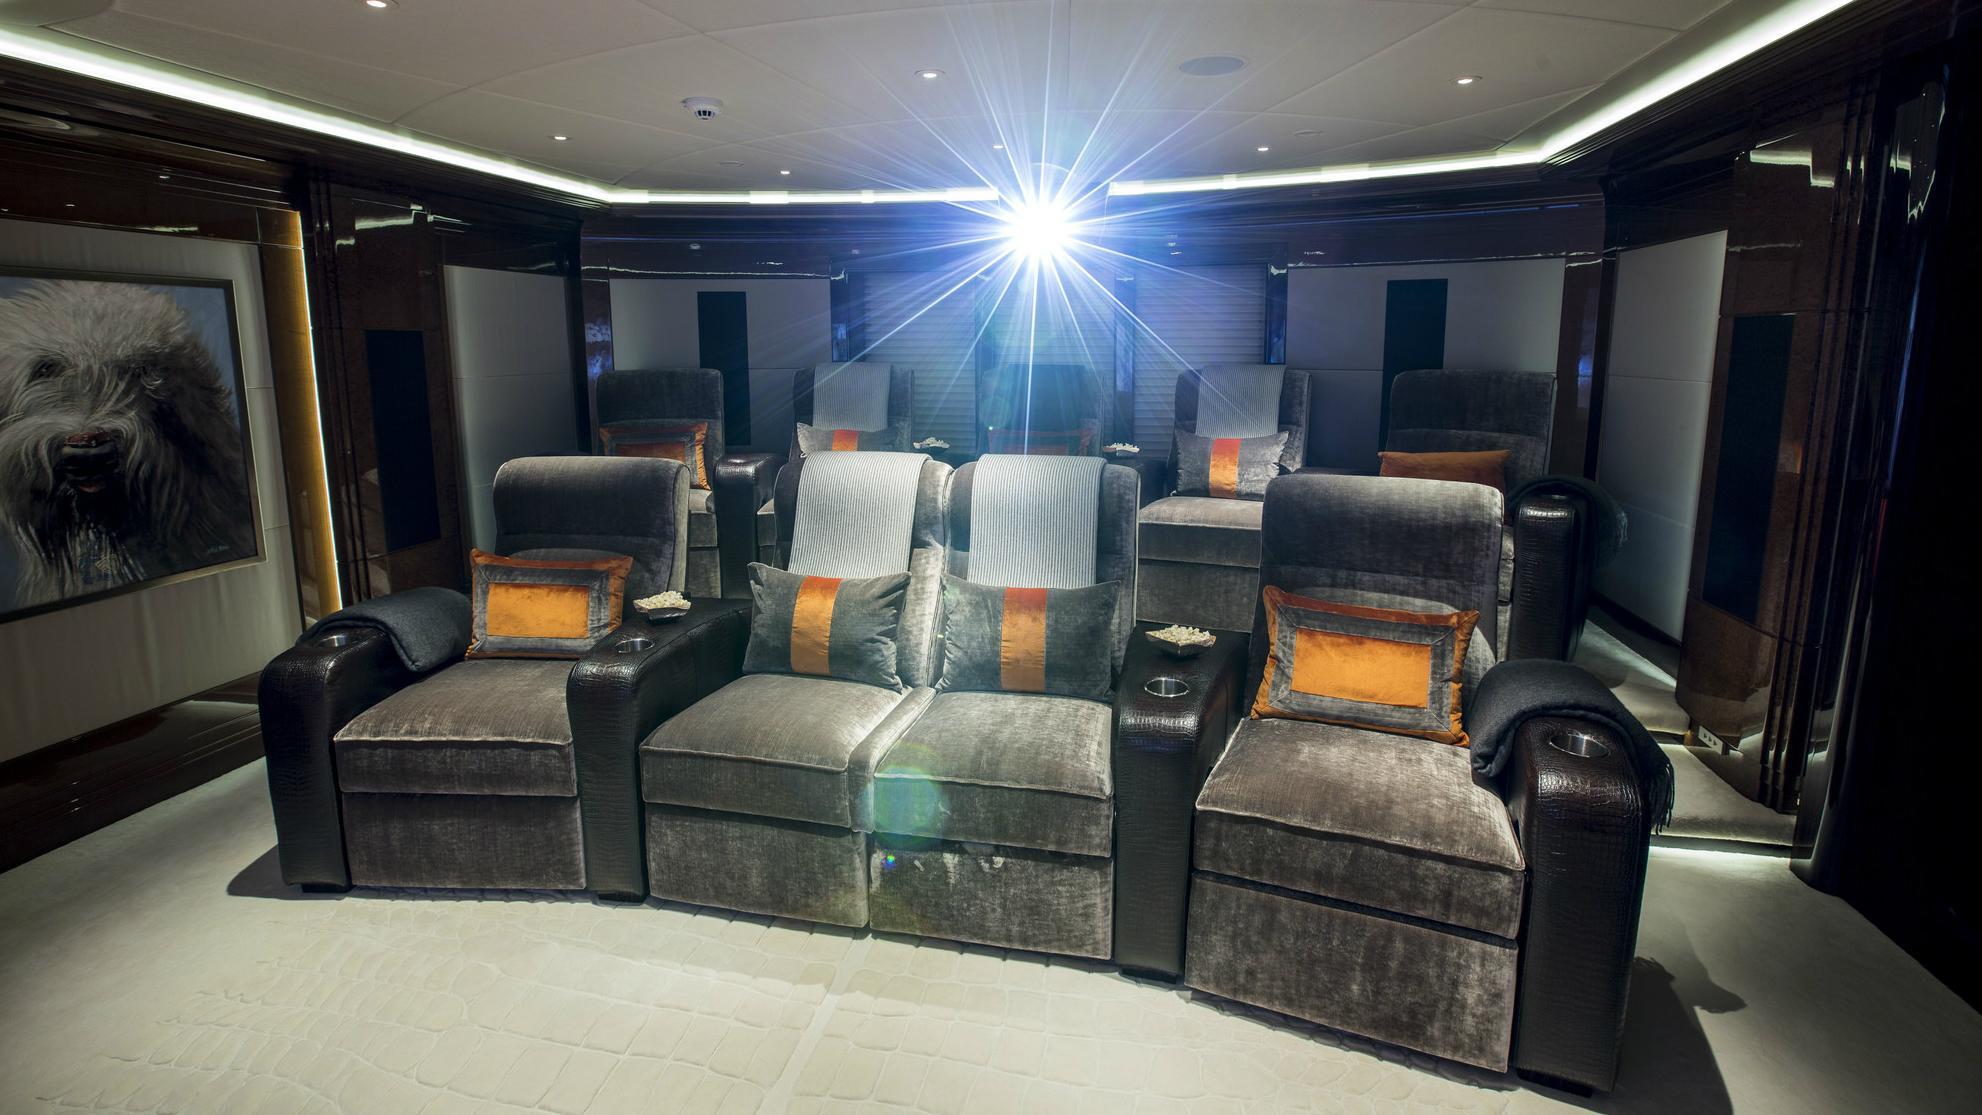 Excellence-V-motor-yacht-abeking-rasmussen-2012-60m-cinema